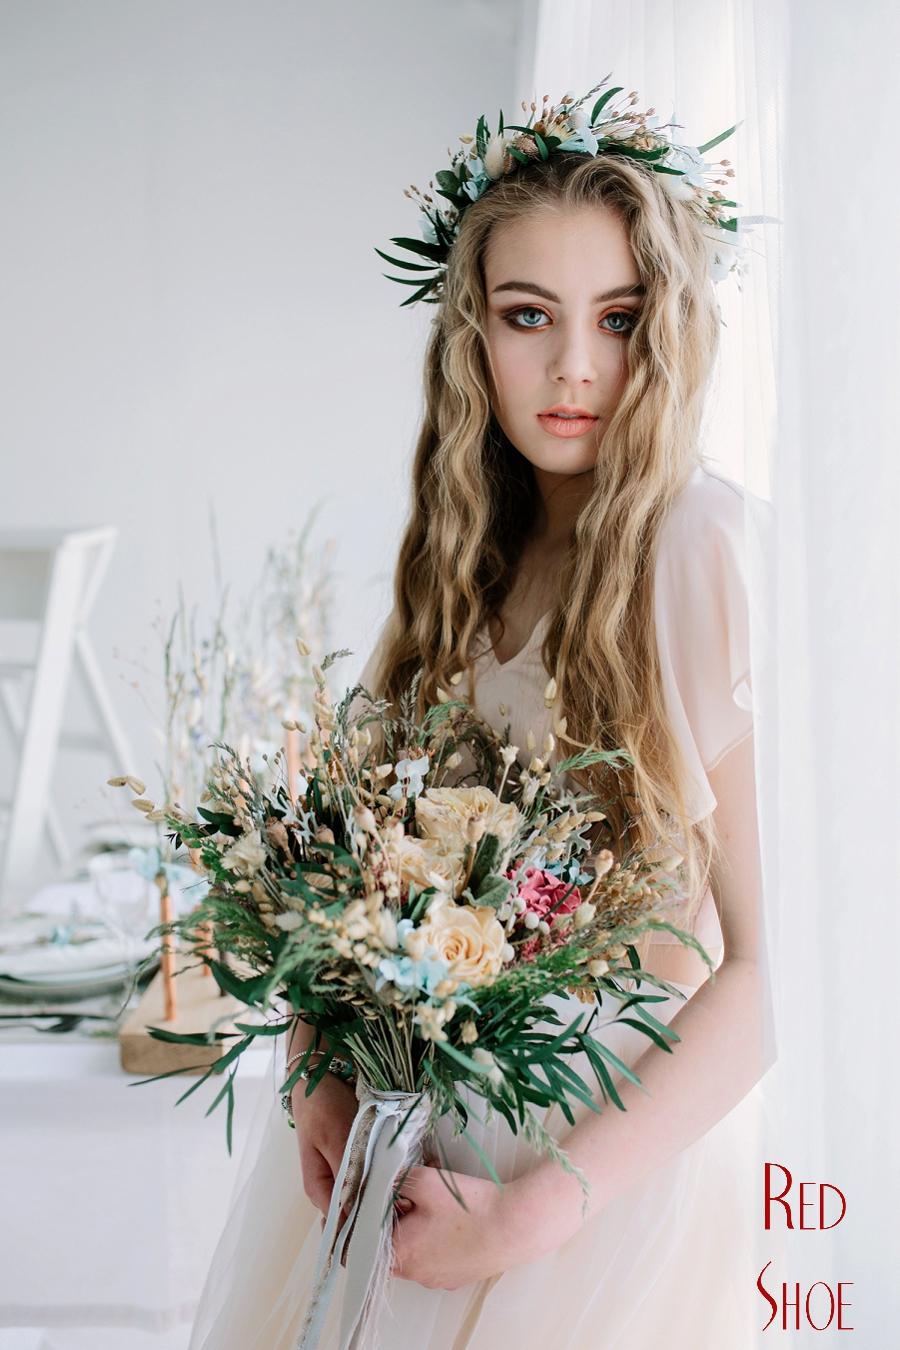 Boho bride, Glam Boho bride, Wedding inspiration, Styled wedding photo shoot, wedding ideas, wedding flower ideas, wedding photography, dried wedding flowers, boho bride makeup ideas_0027.jpg